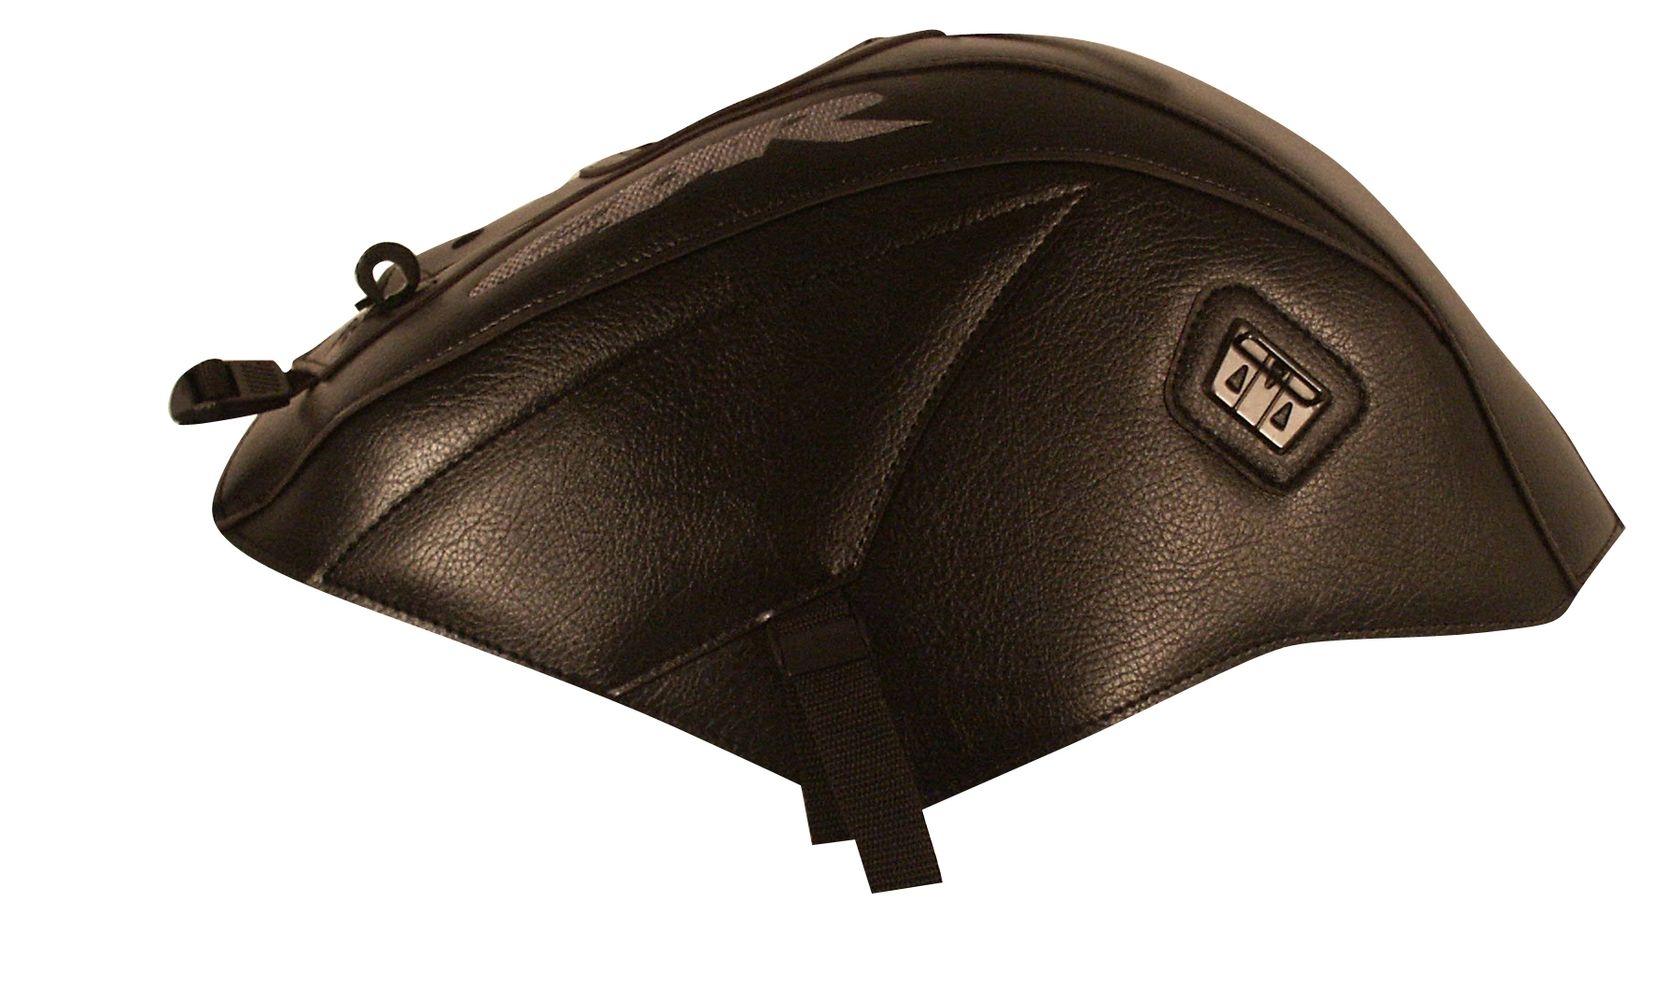 Protège-réservoir Bagster Honda CBR 125 / CBR 250 04-09 noir